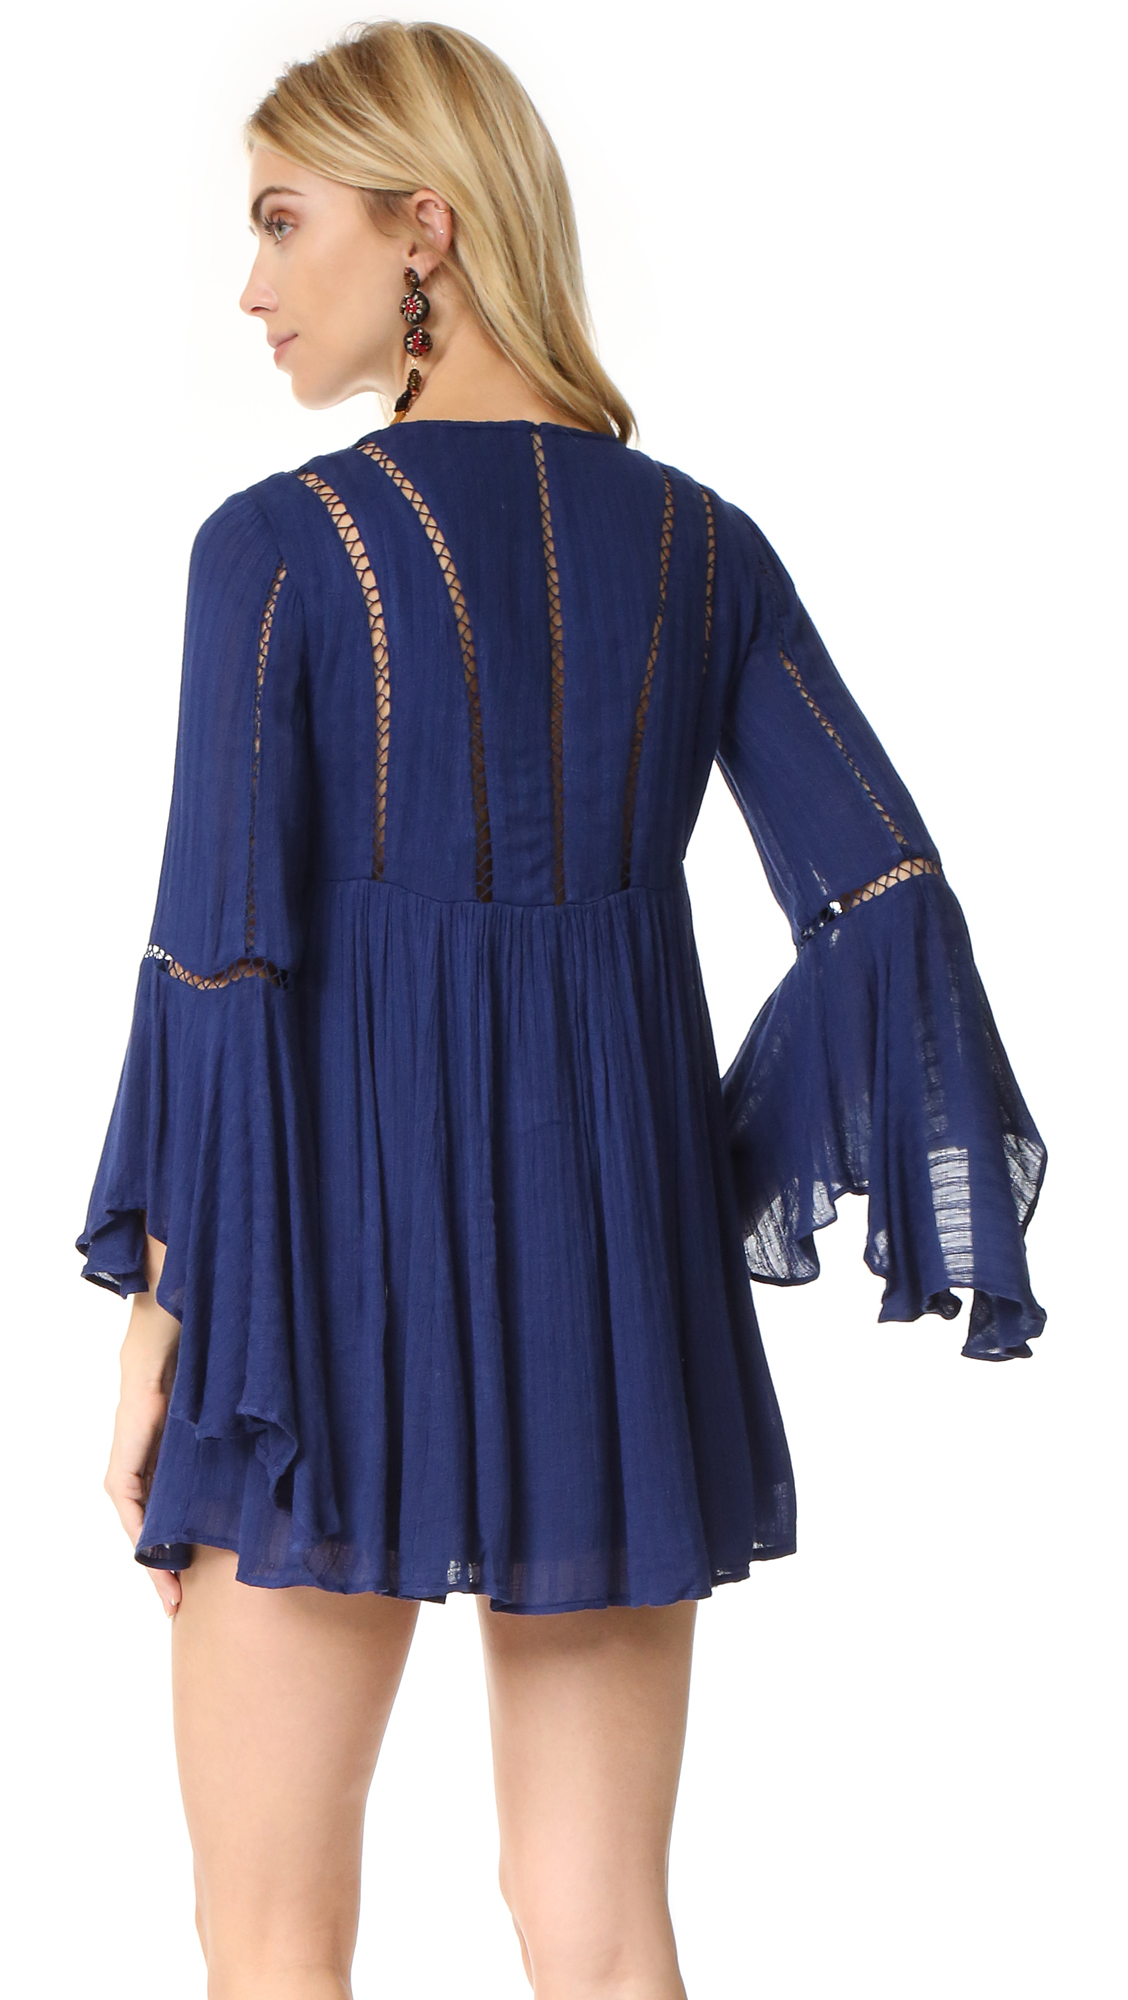 95bf82b1956 Free People Romeo Mini Dress